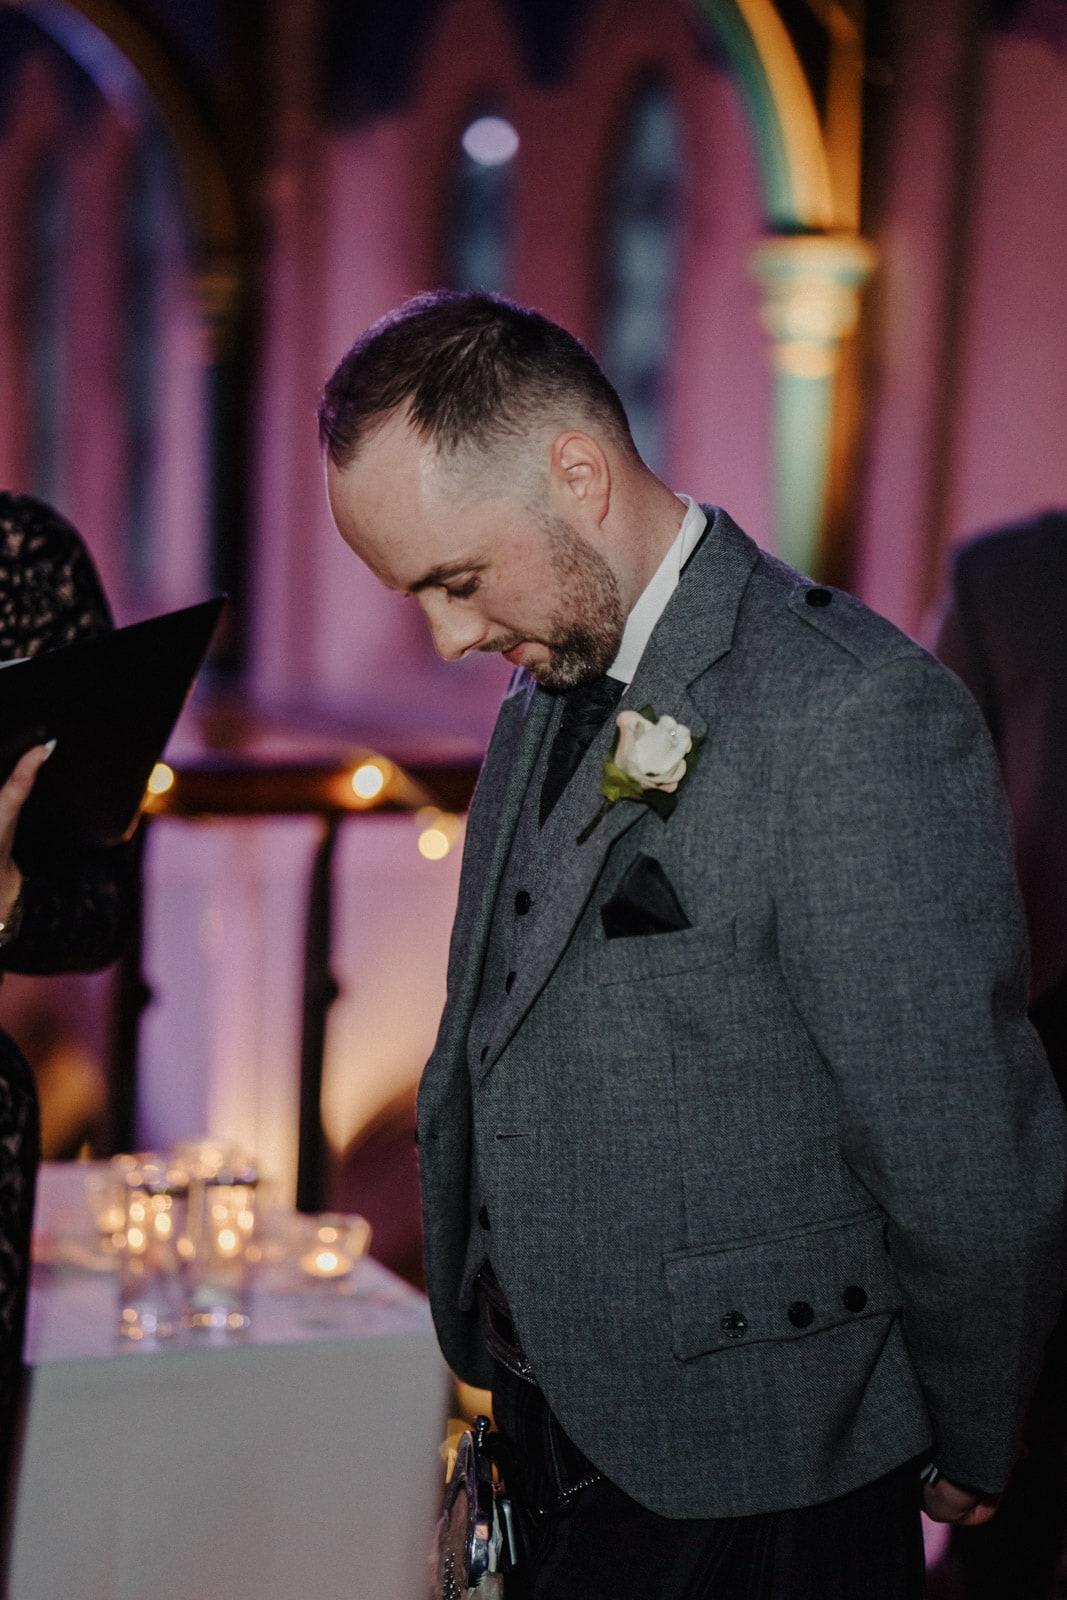 Oran-Mor-Wedding-Photographer-DearlyPhotography (18 of 55).jpg